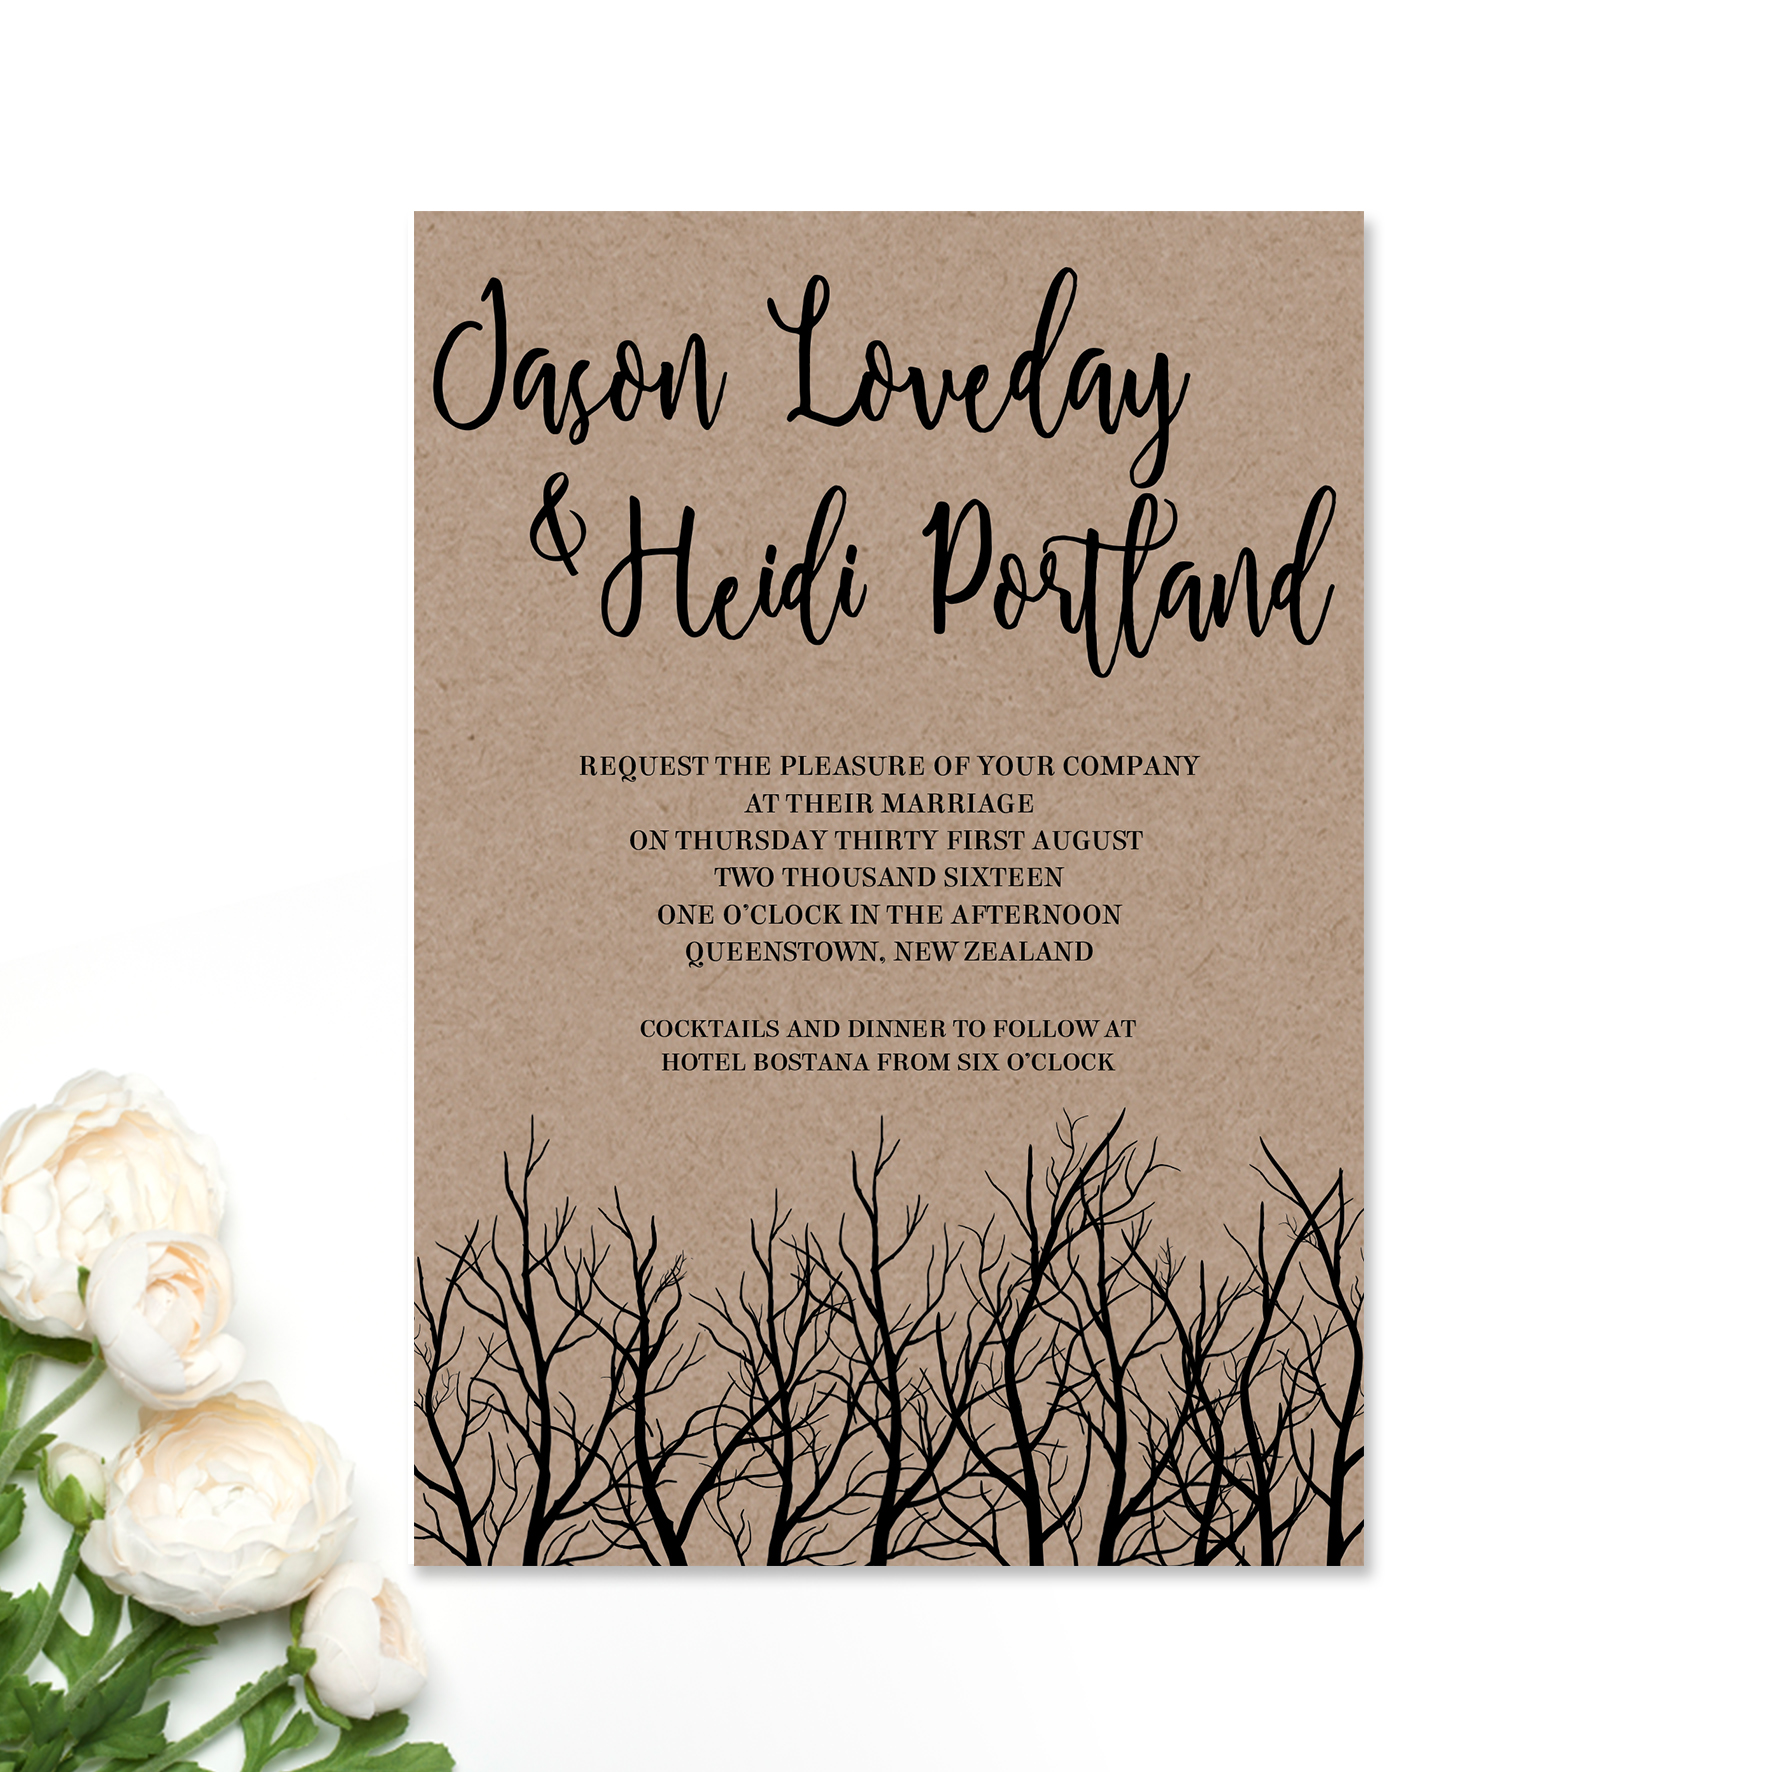 Jason + Heidi Wedding Invitation